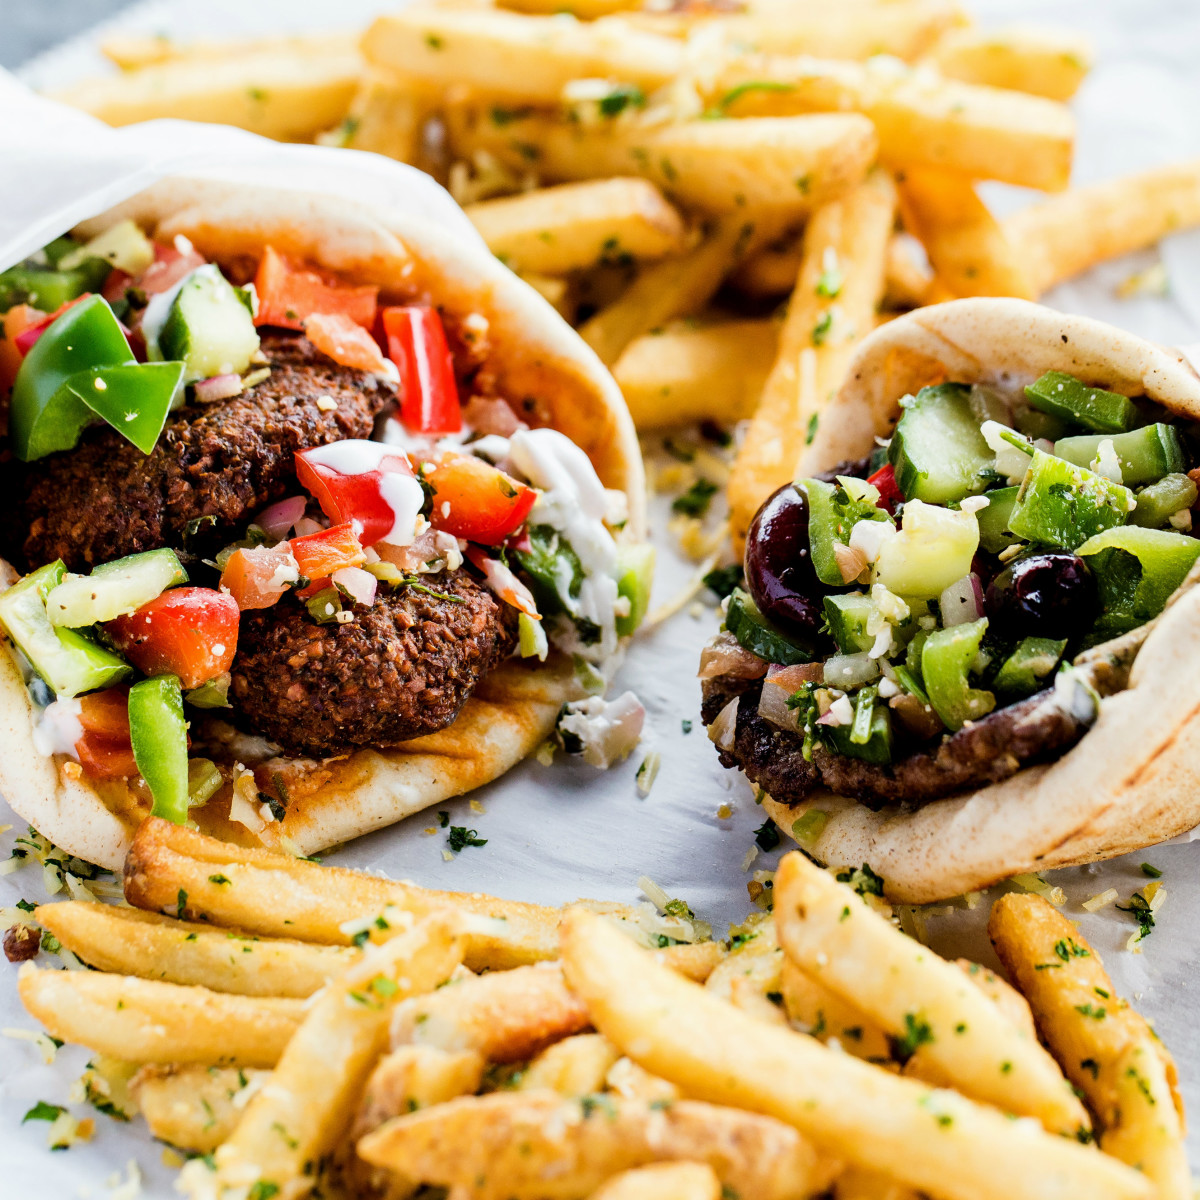 Antone's Famous Po' Boys Mediterranean menu